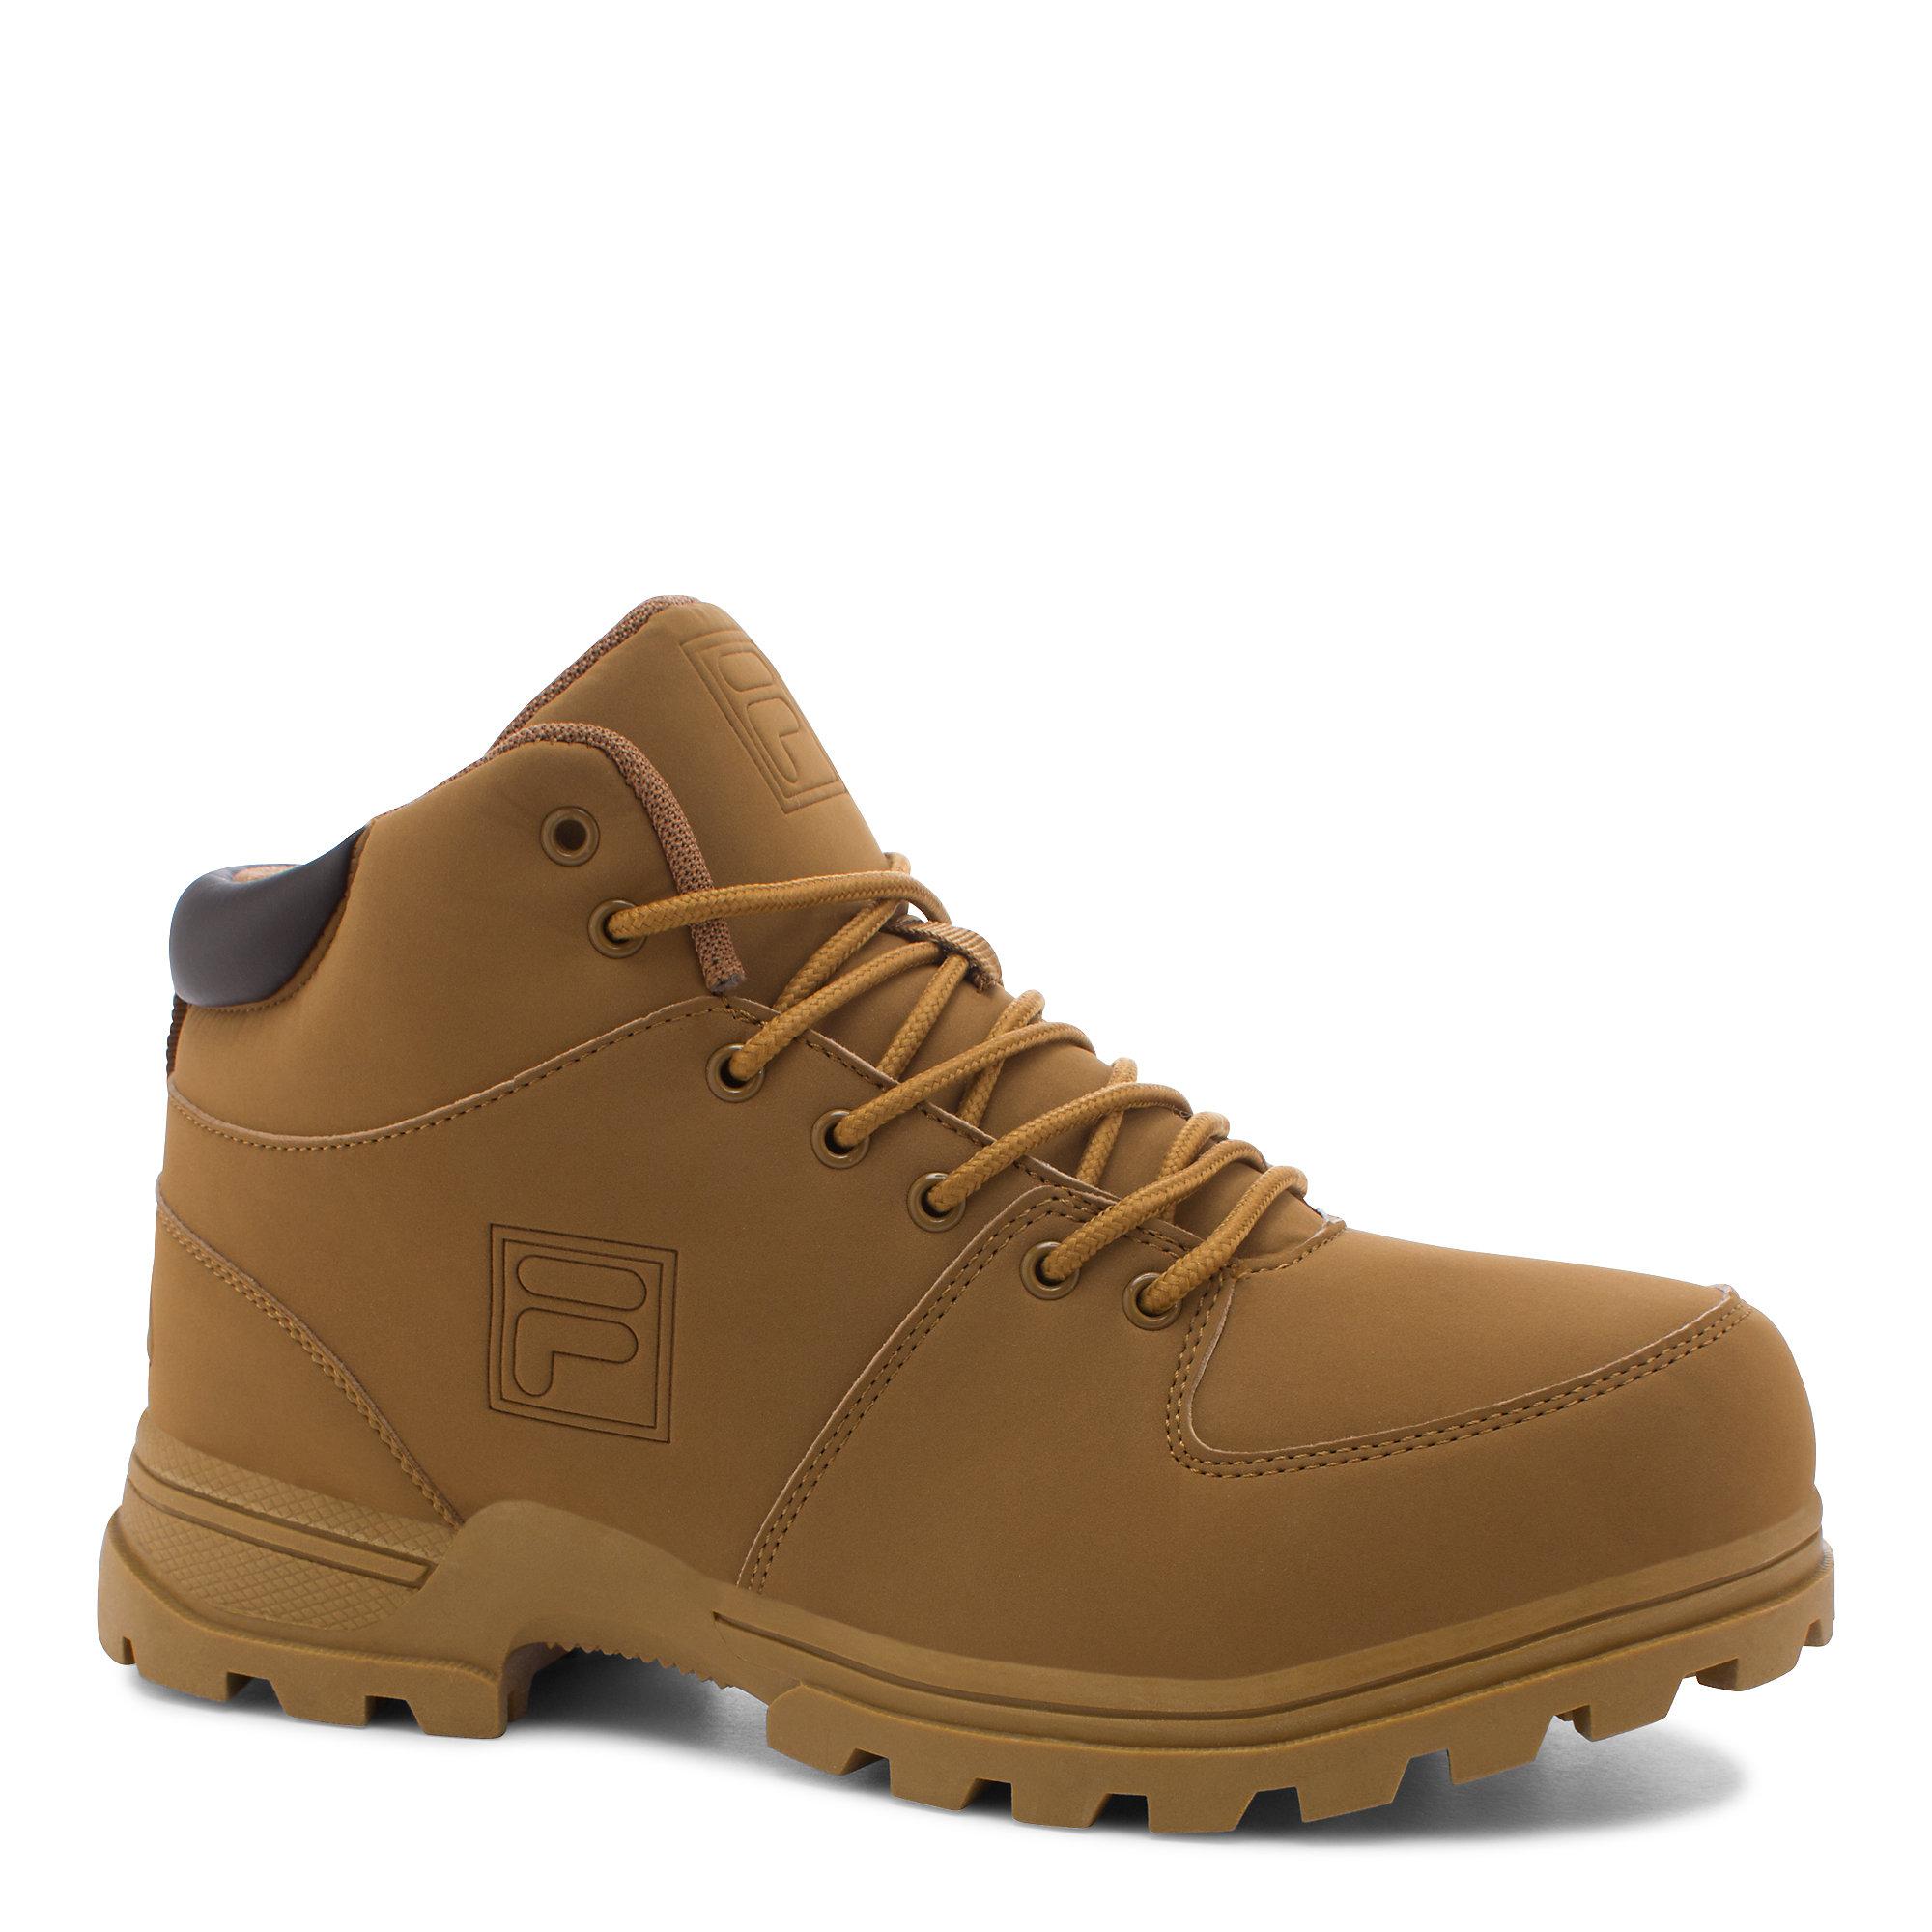 FILA Men's Ascender 2 Boots | eBay